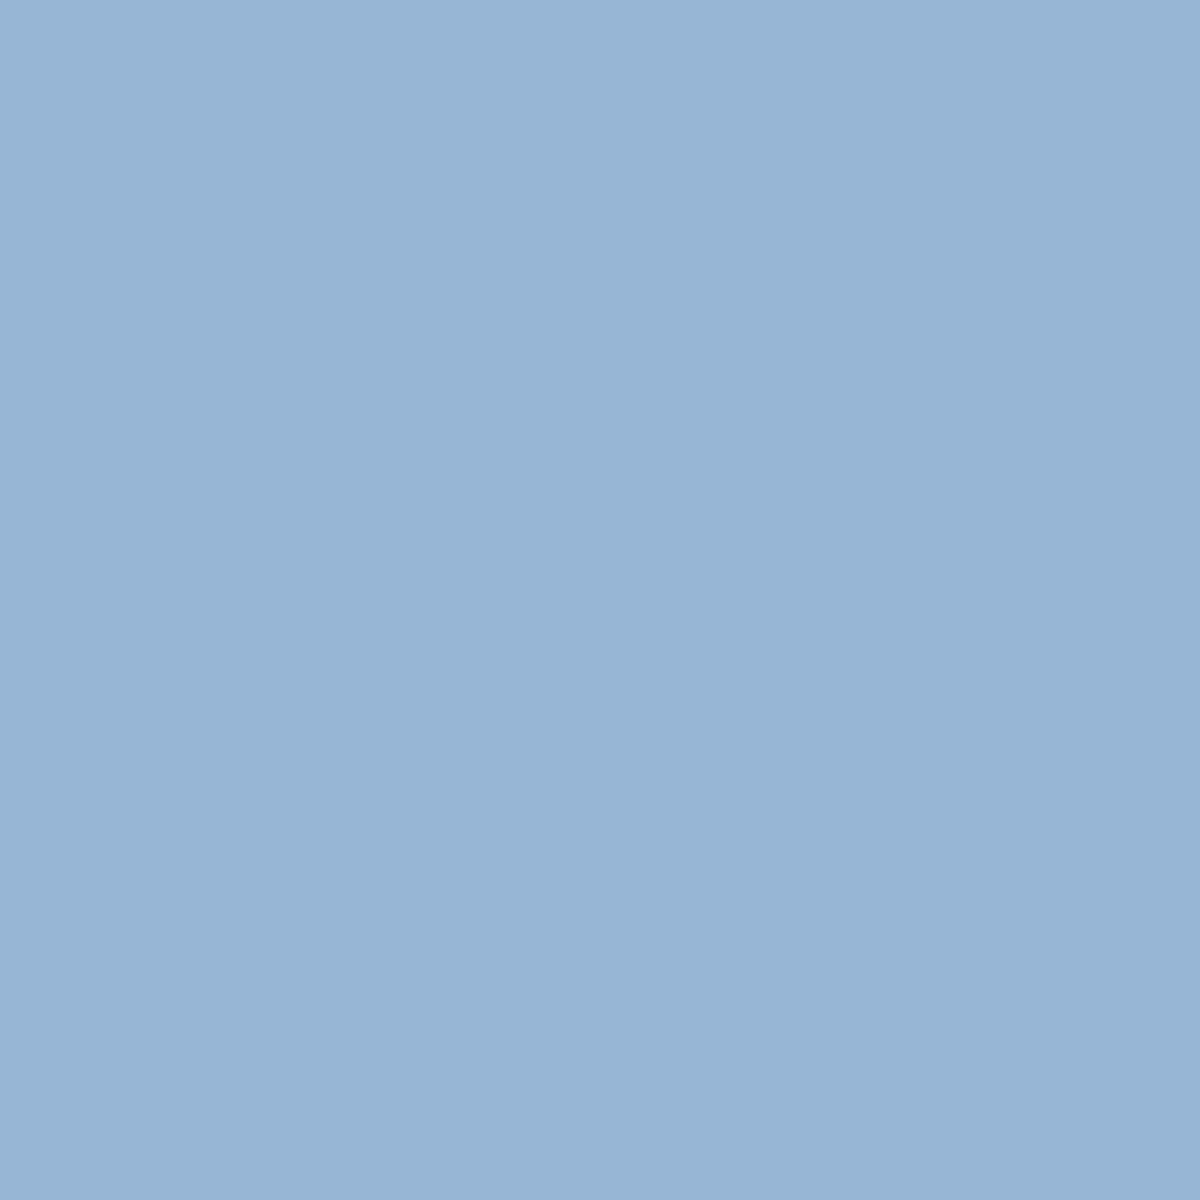 LY-TB049无机水蓝.jpg